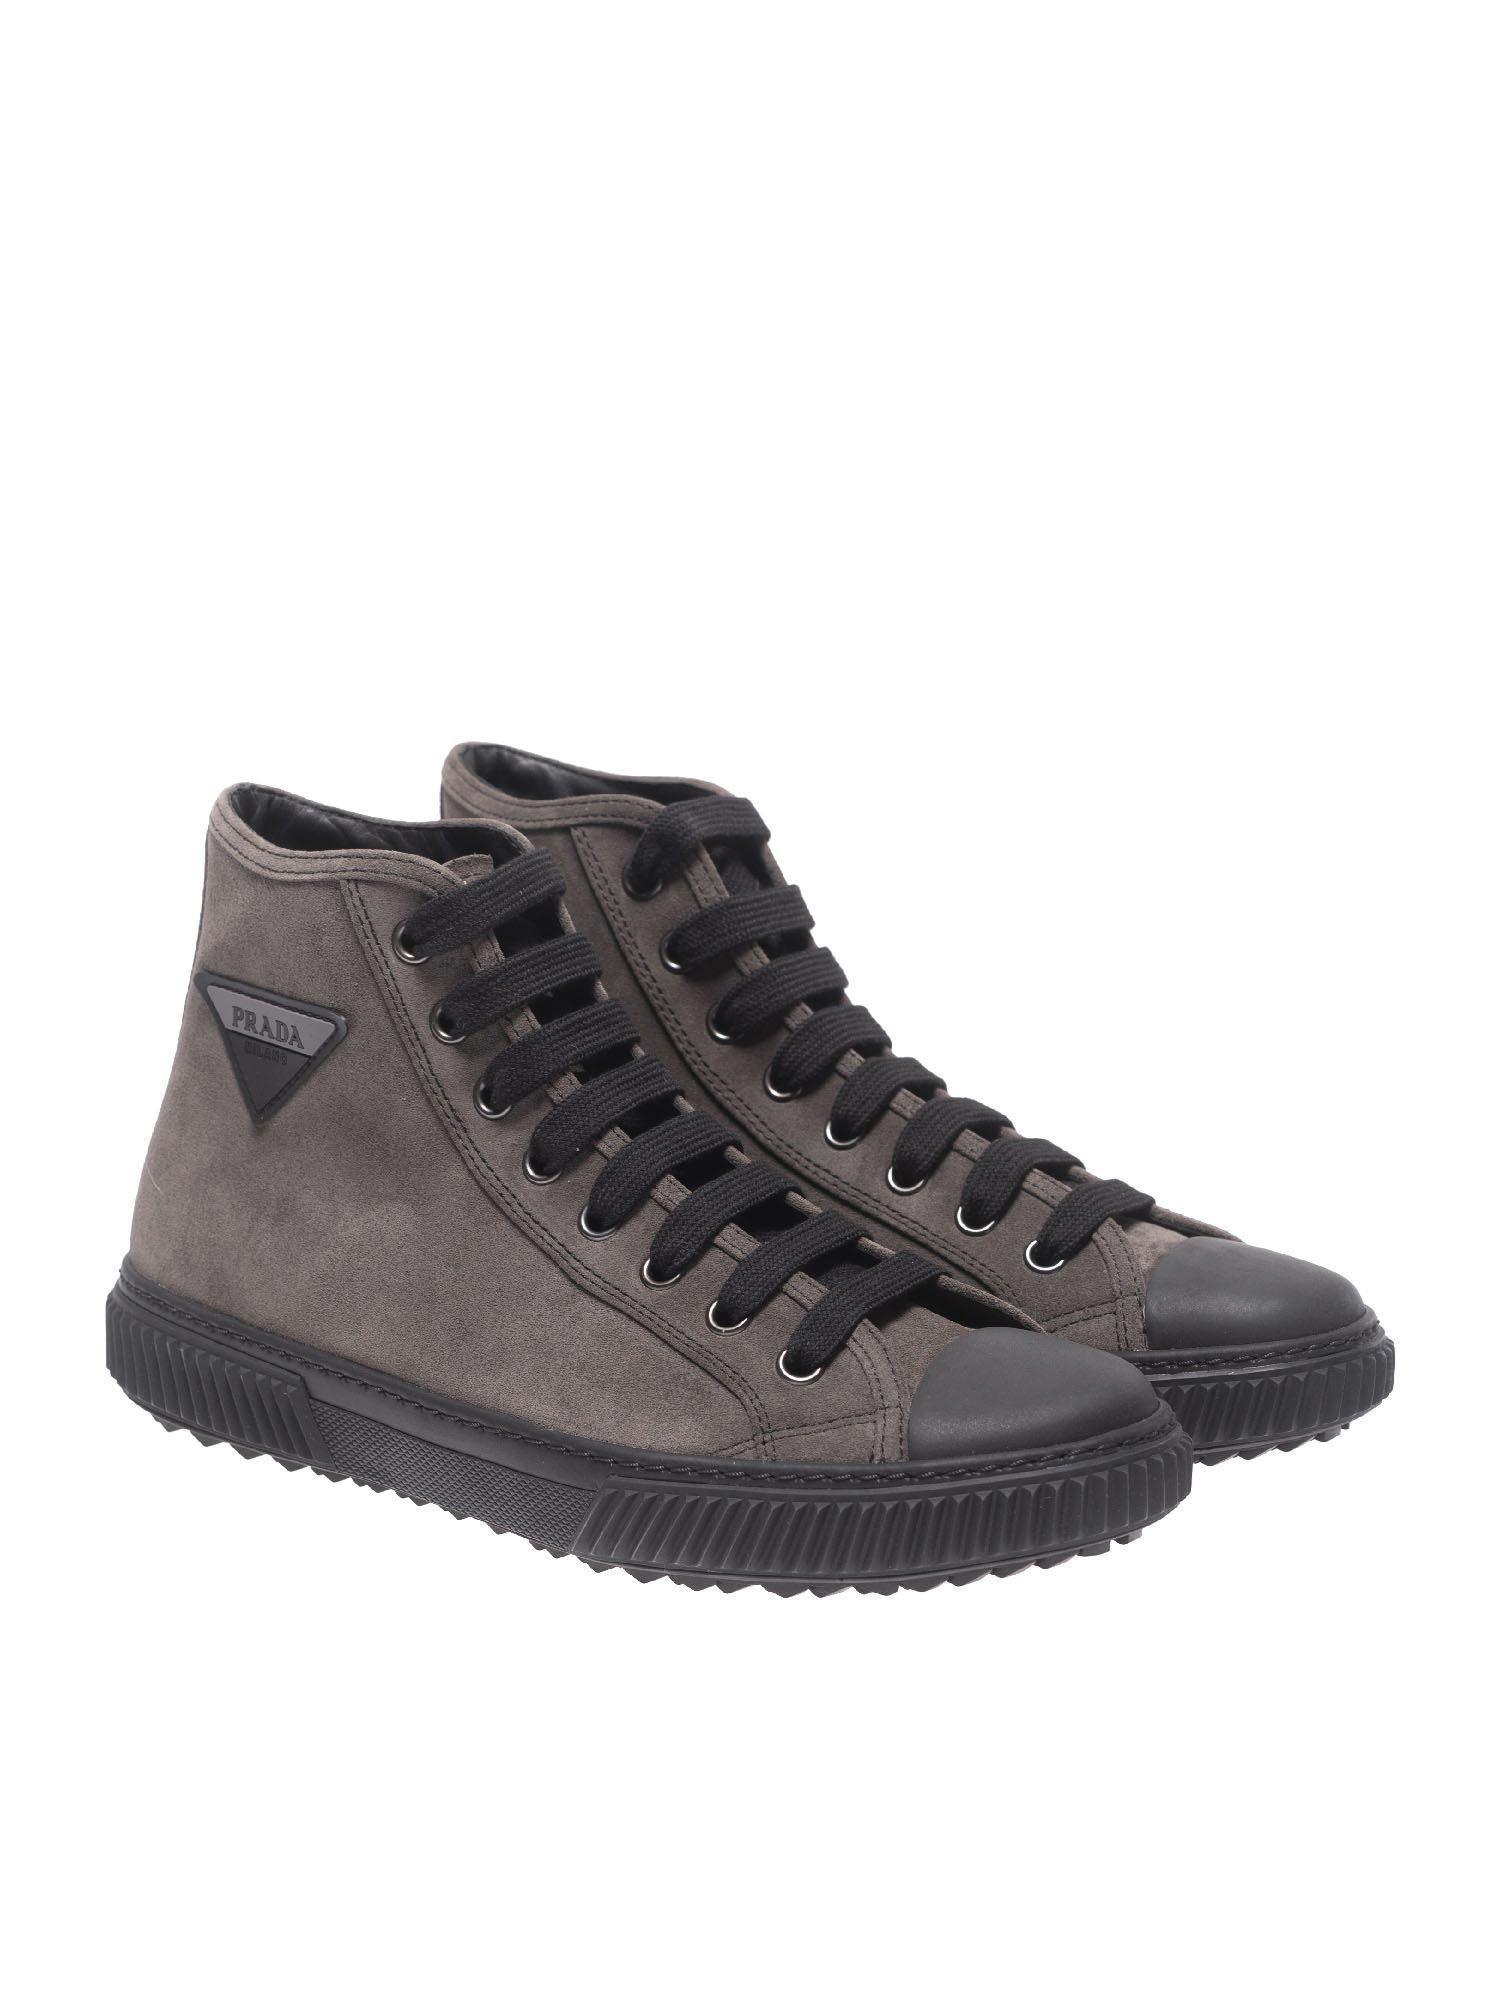 0b601032 50% off prada mesh leather velco high shoes for men blue gray 69dd8 ...